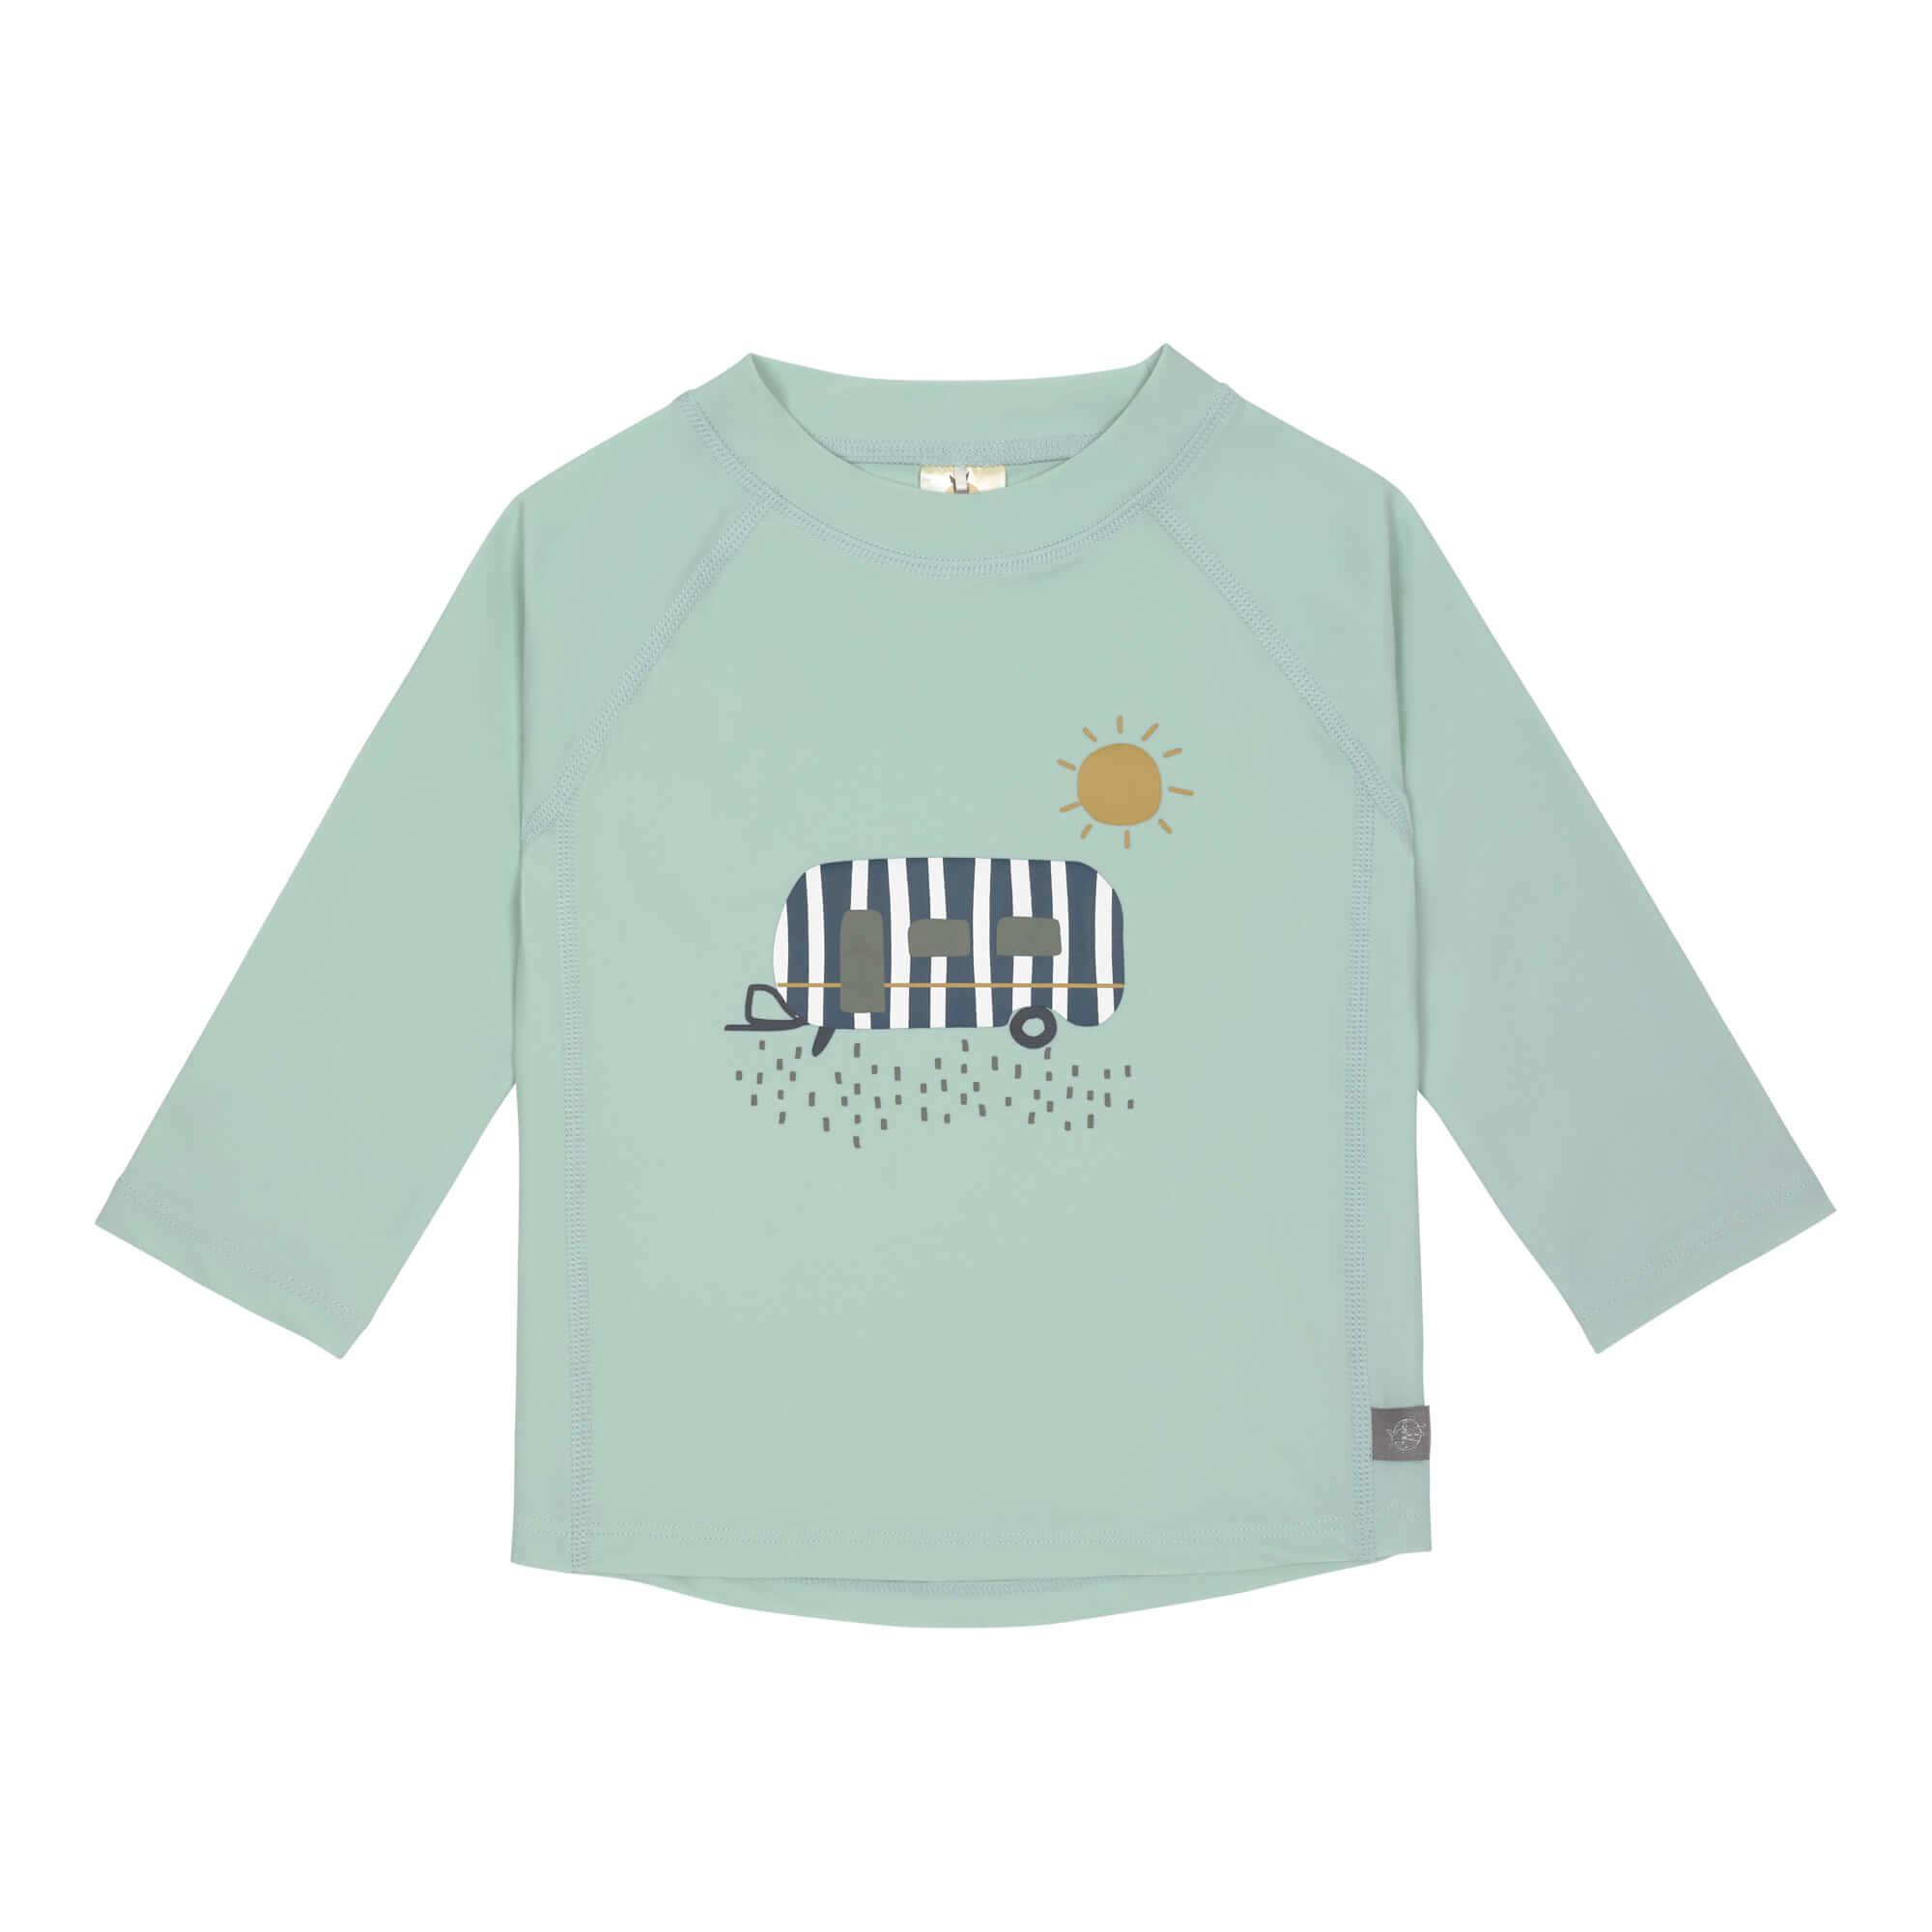 Lässig Splash & Fun Lange mouw Rashguard UV zwemshirt - Caravan mint